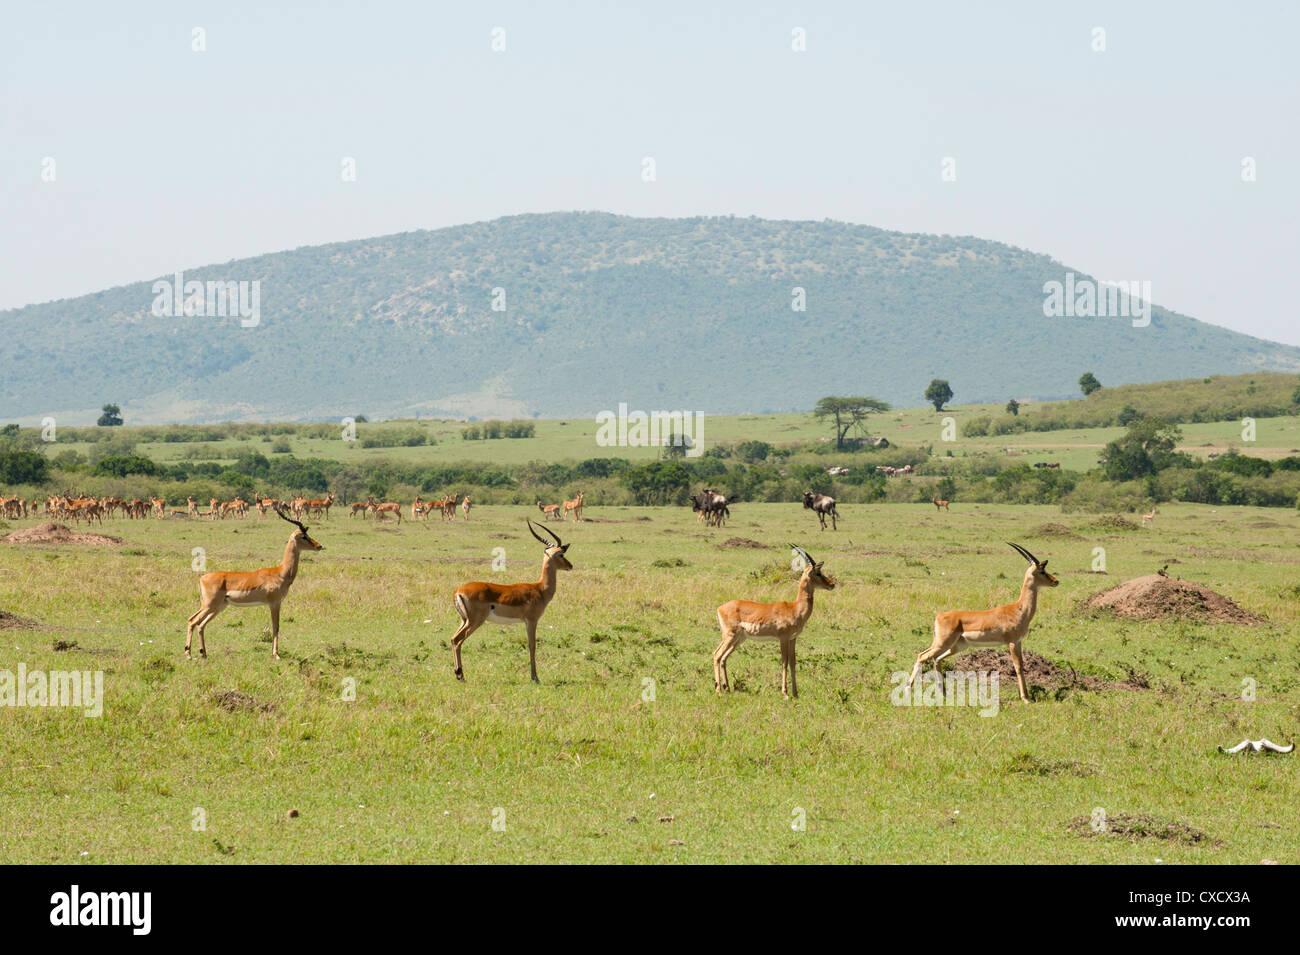 Impala (Aepyceros melampus), Masai Mara, Kenya, East Africa, Africa Stock Photo